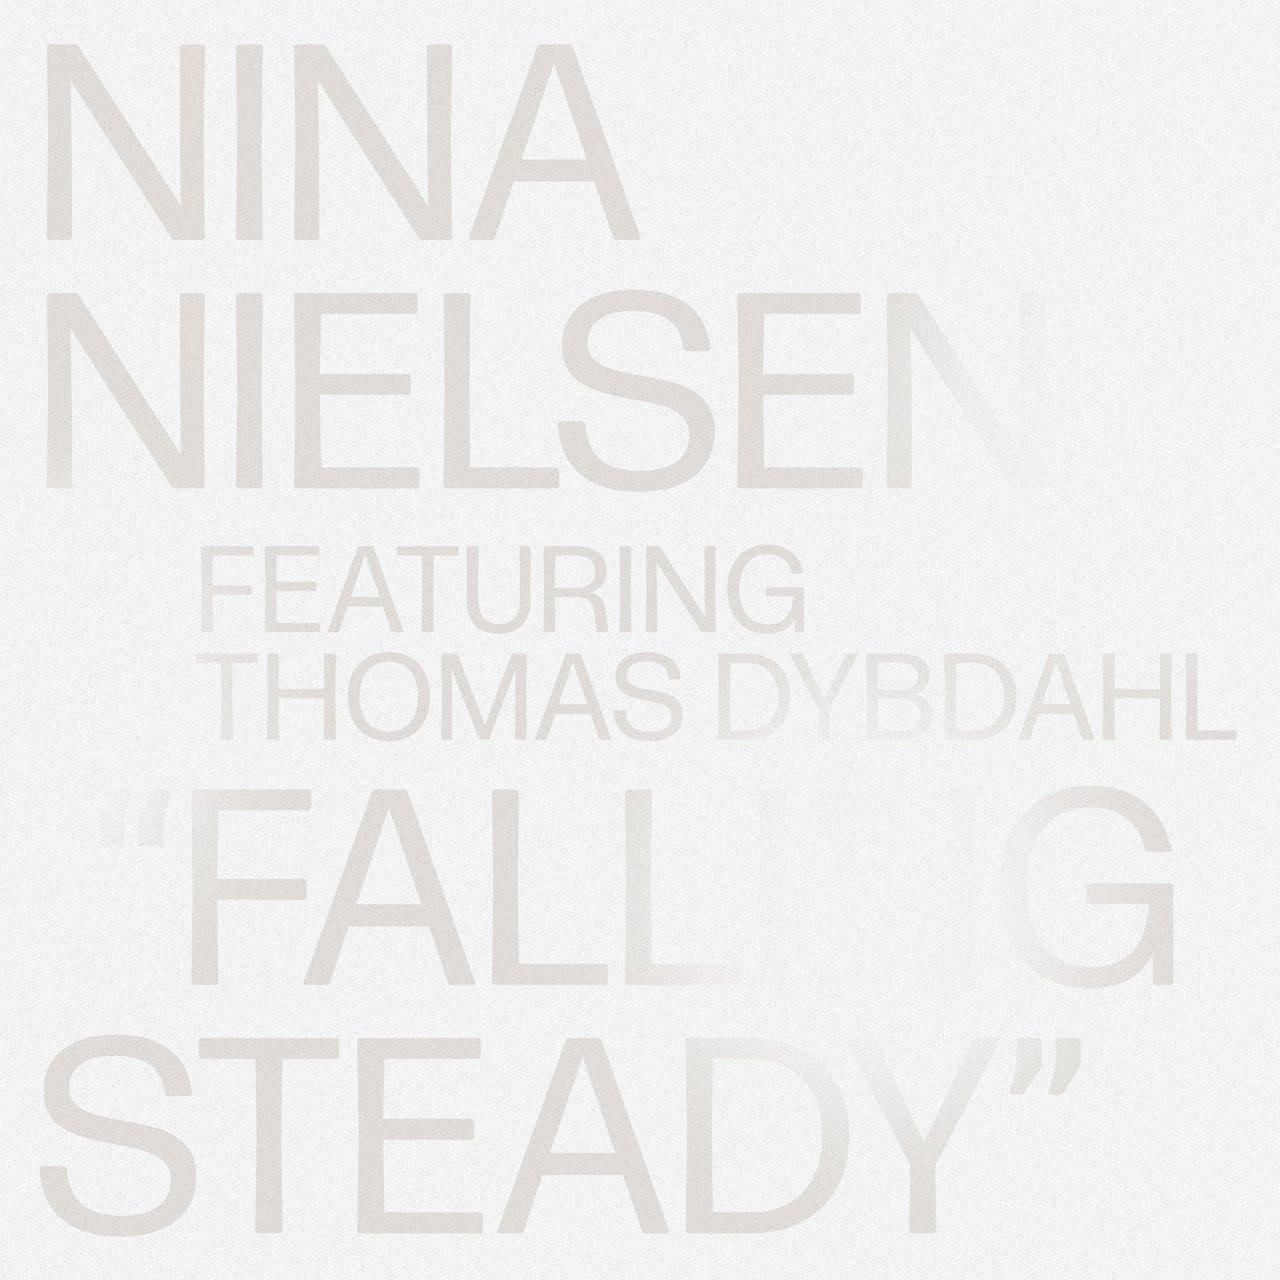 nina nielsen thomas dybdahl - falling steady.jpg